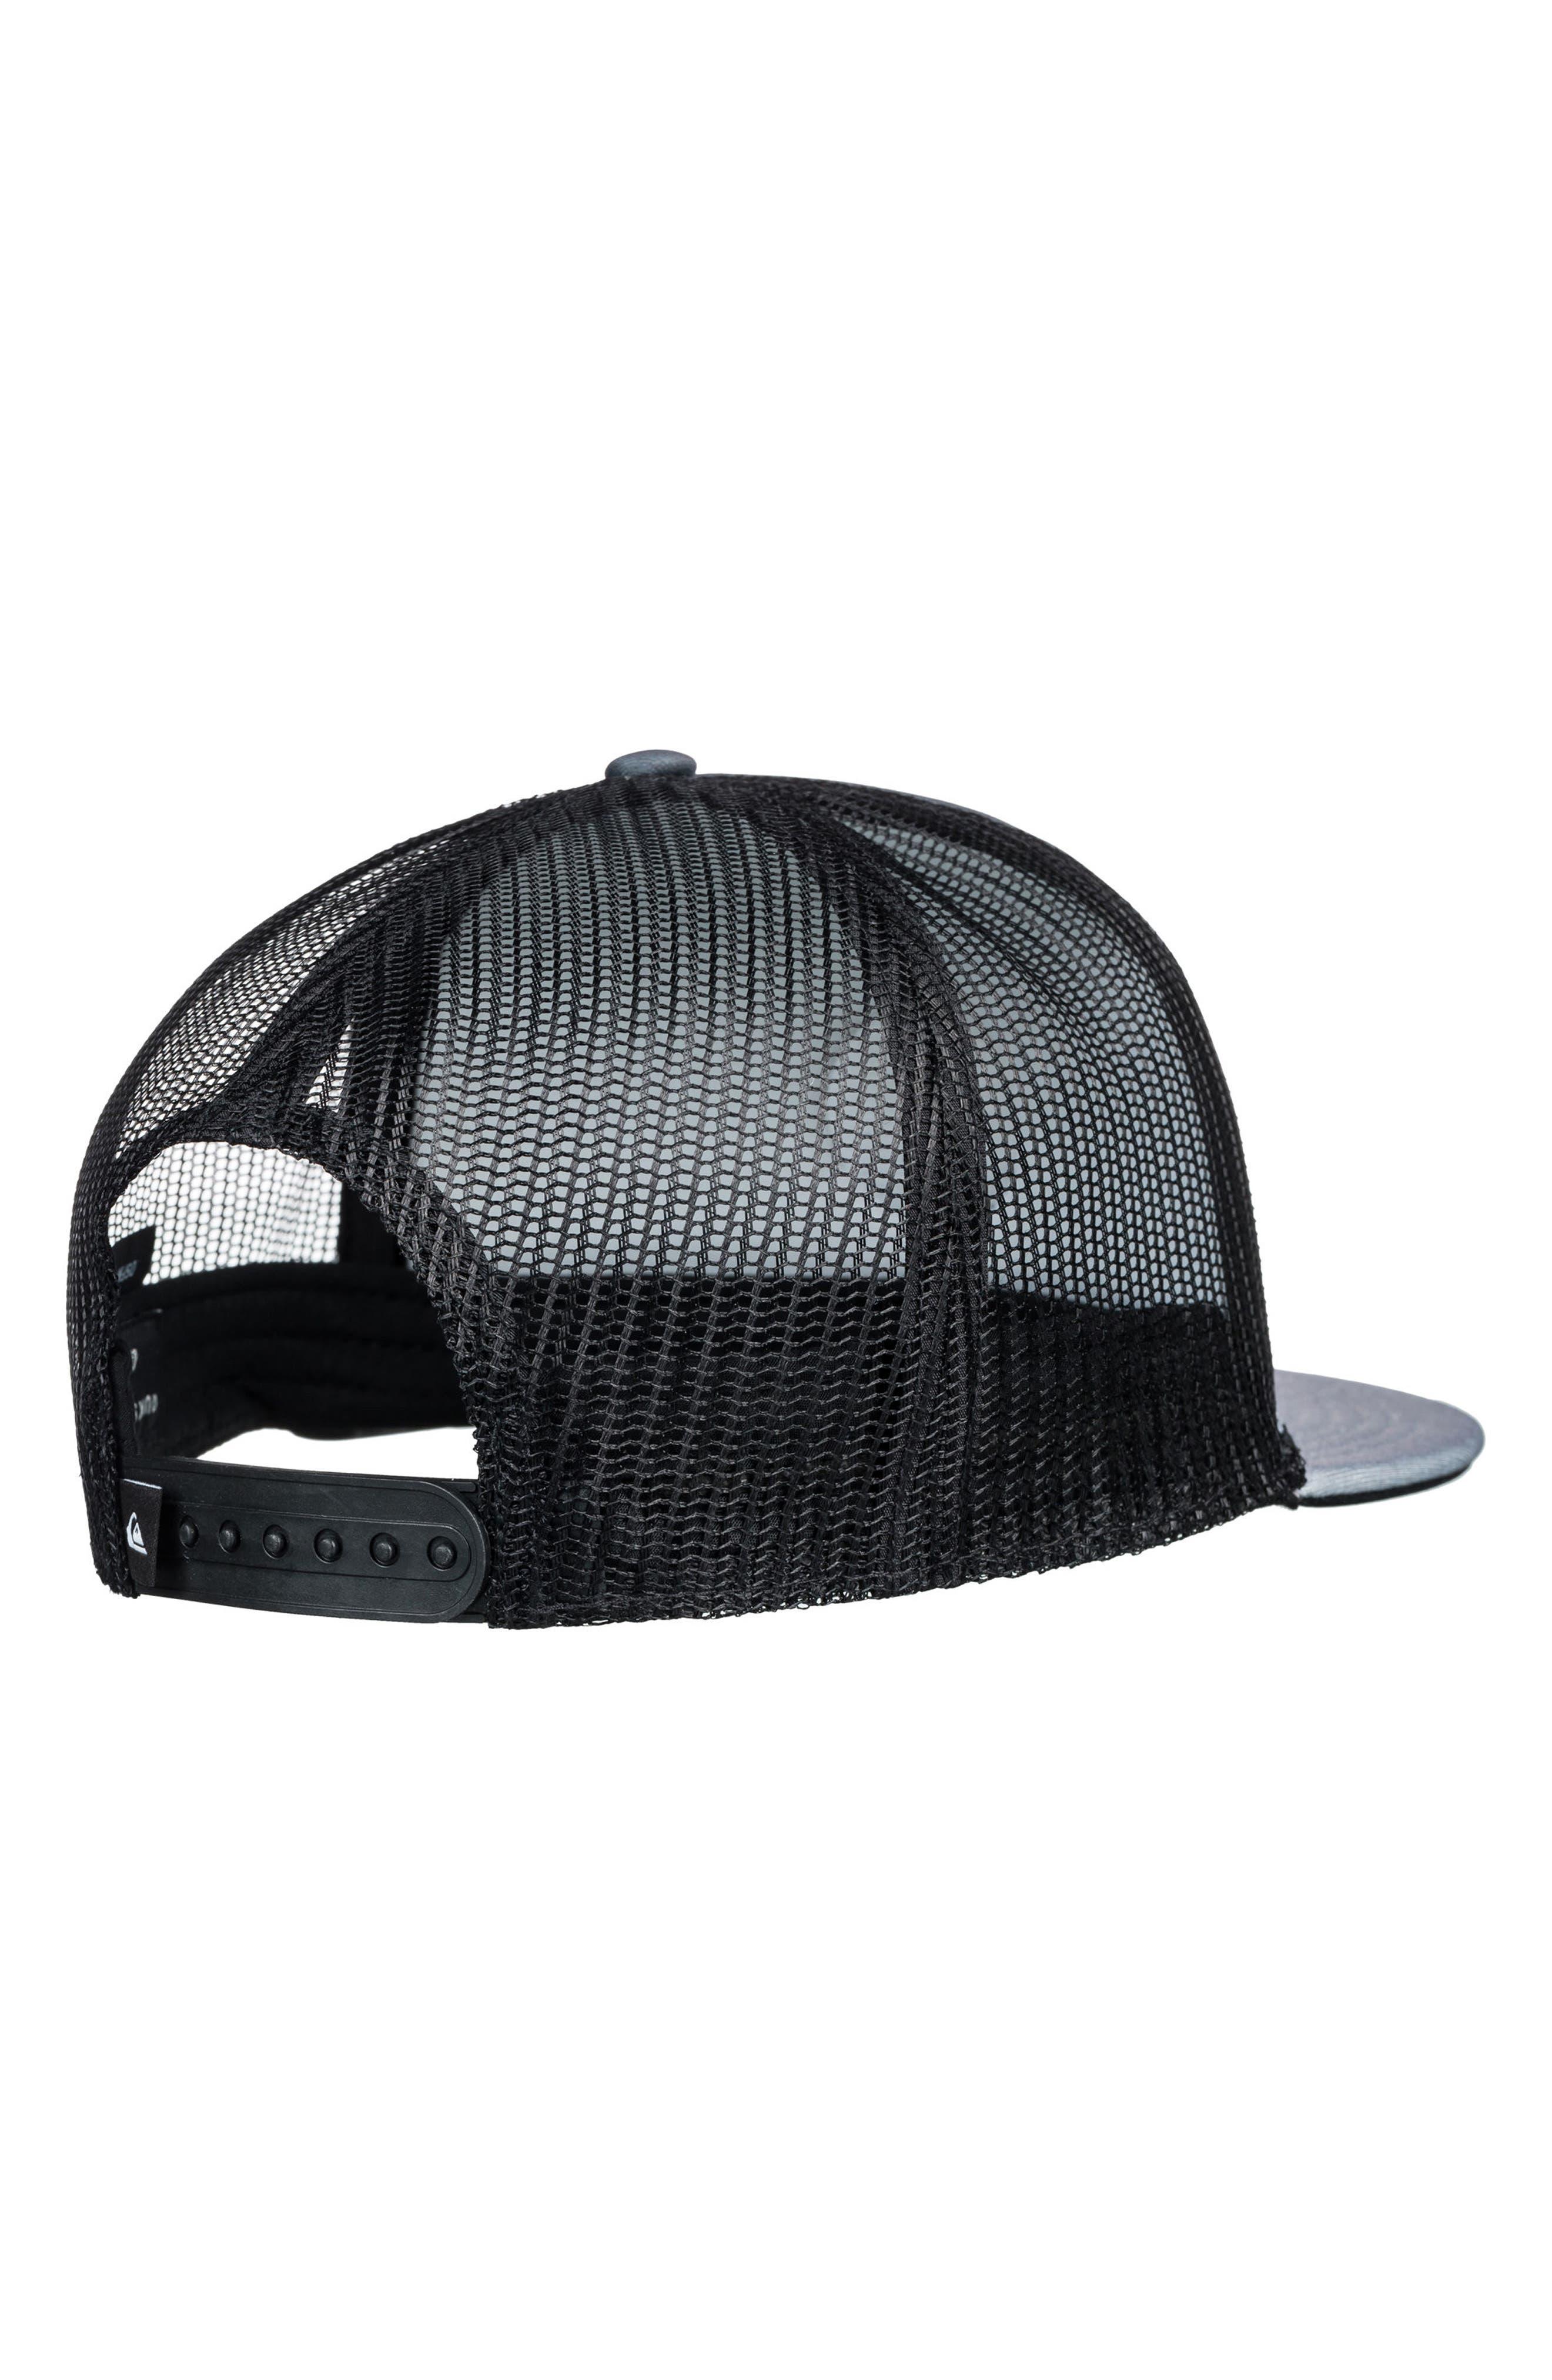 Vixten Trucker Hat,                             Alternate thumbnail 2, color,                             022